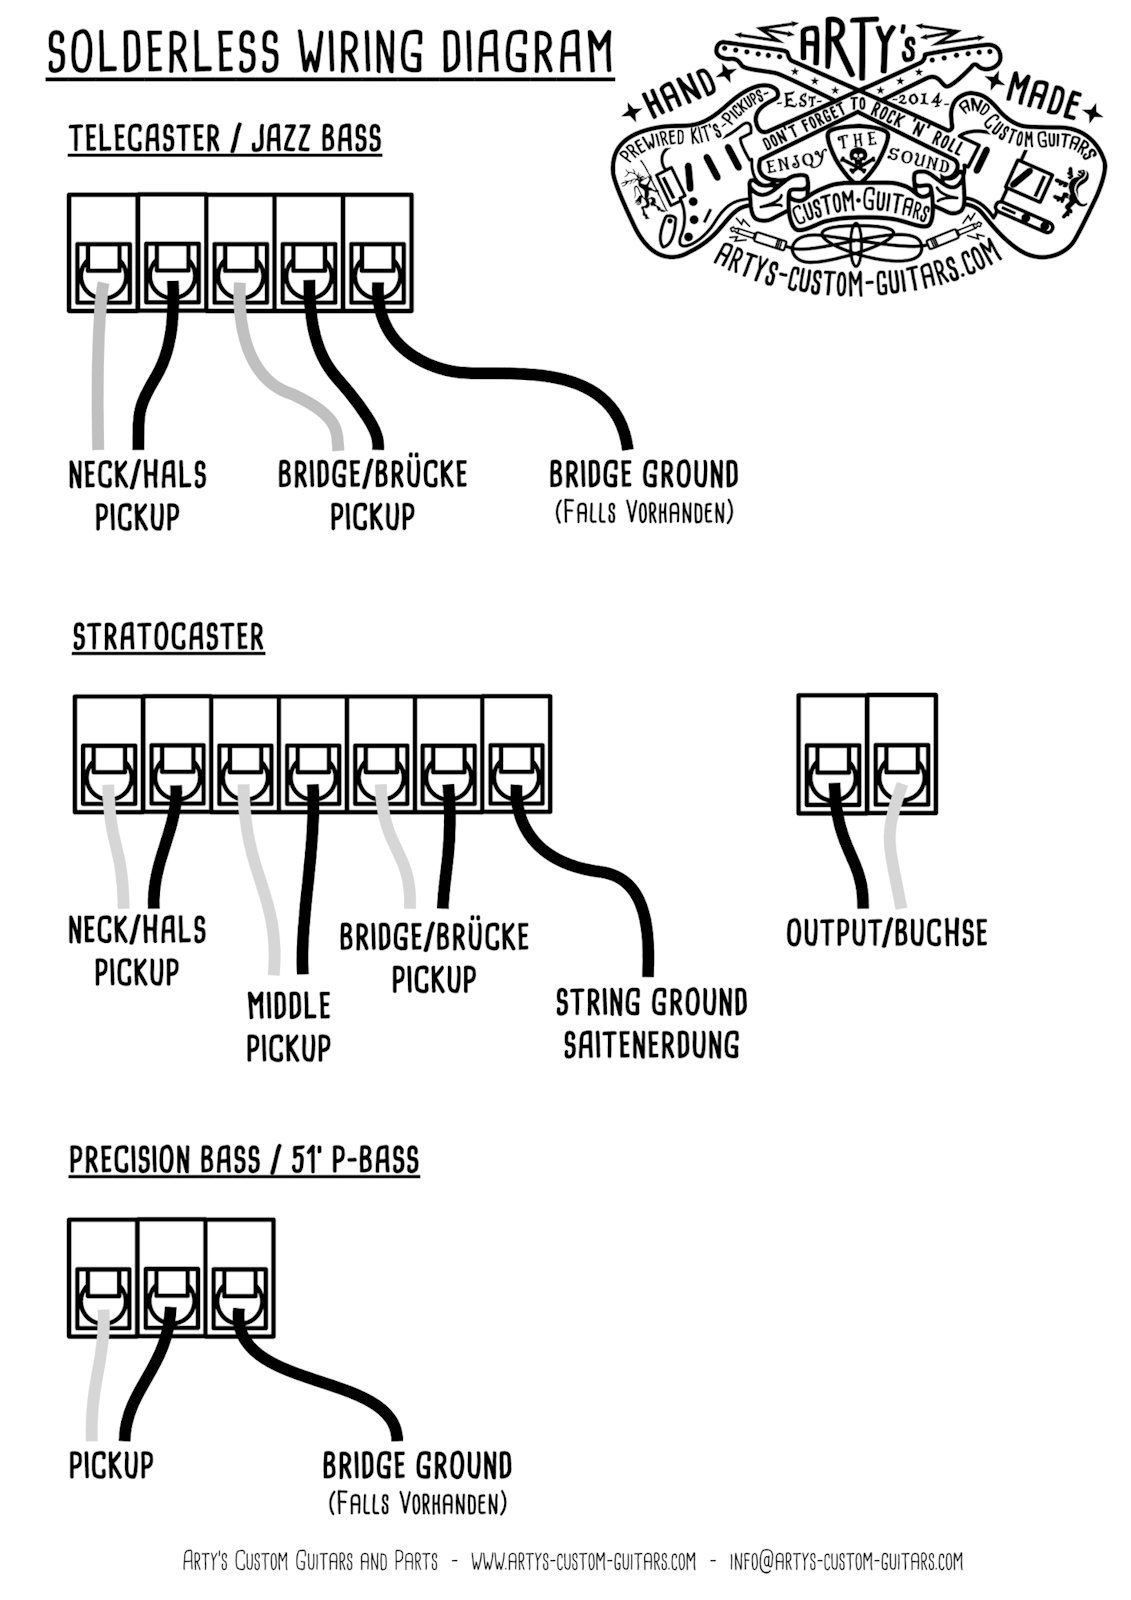 Jazz Bass Wiring Diagram Inspirational Image Custom Telecaster Arty S Guitars Solderless Stratocaster Precision